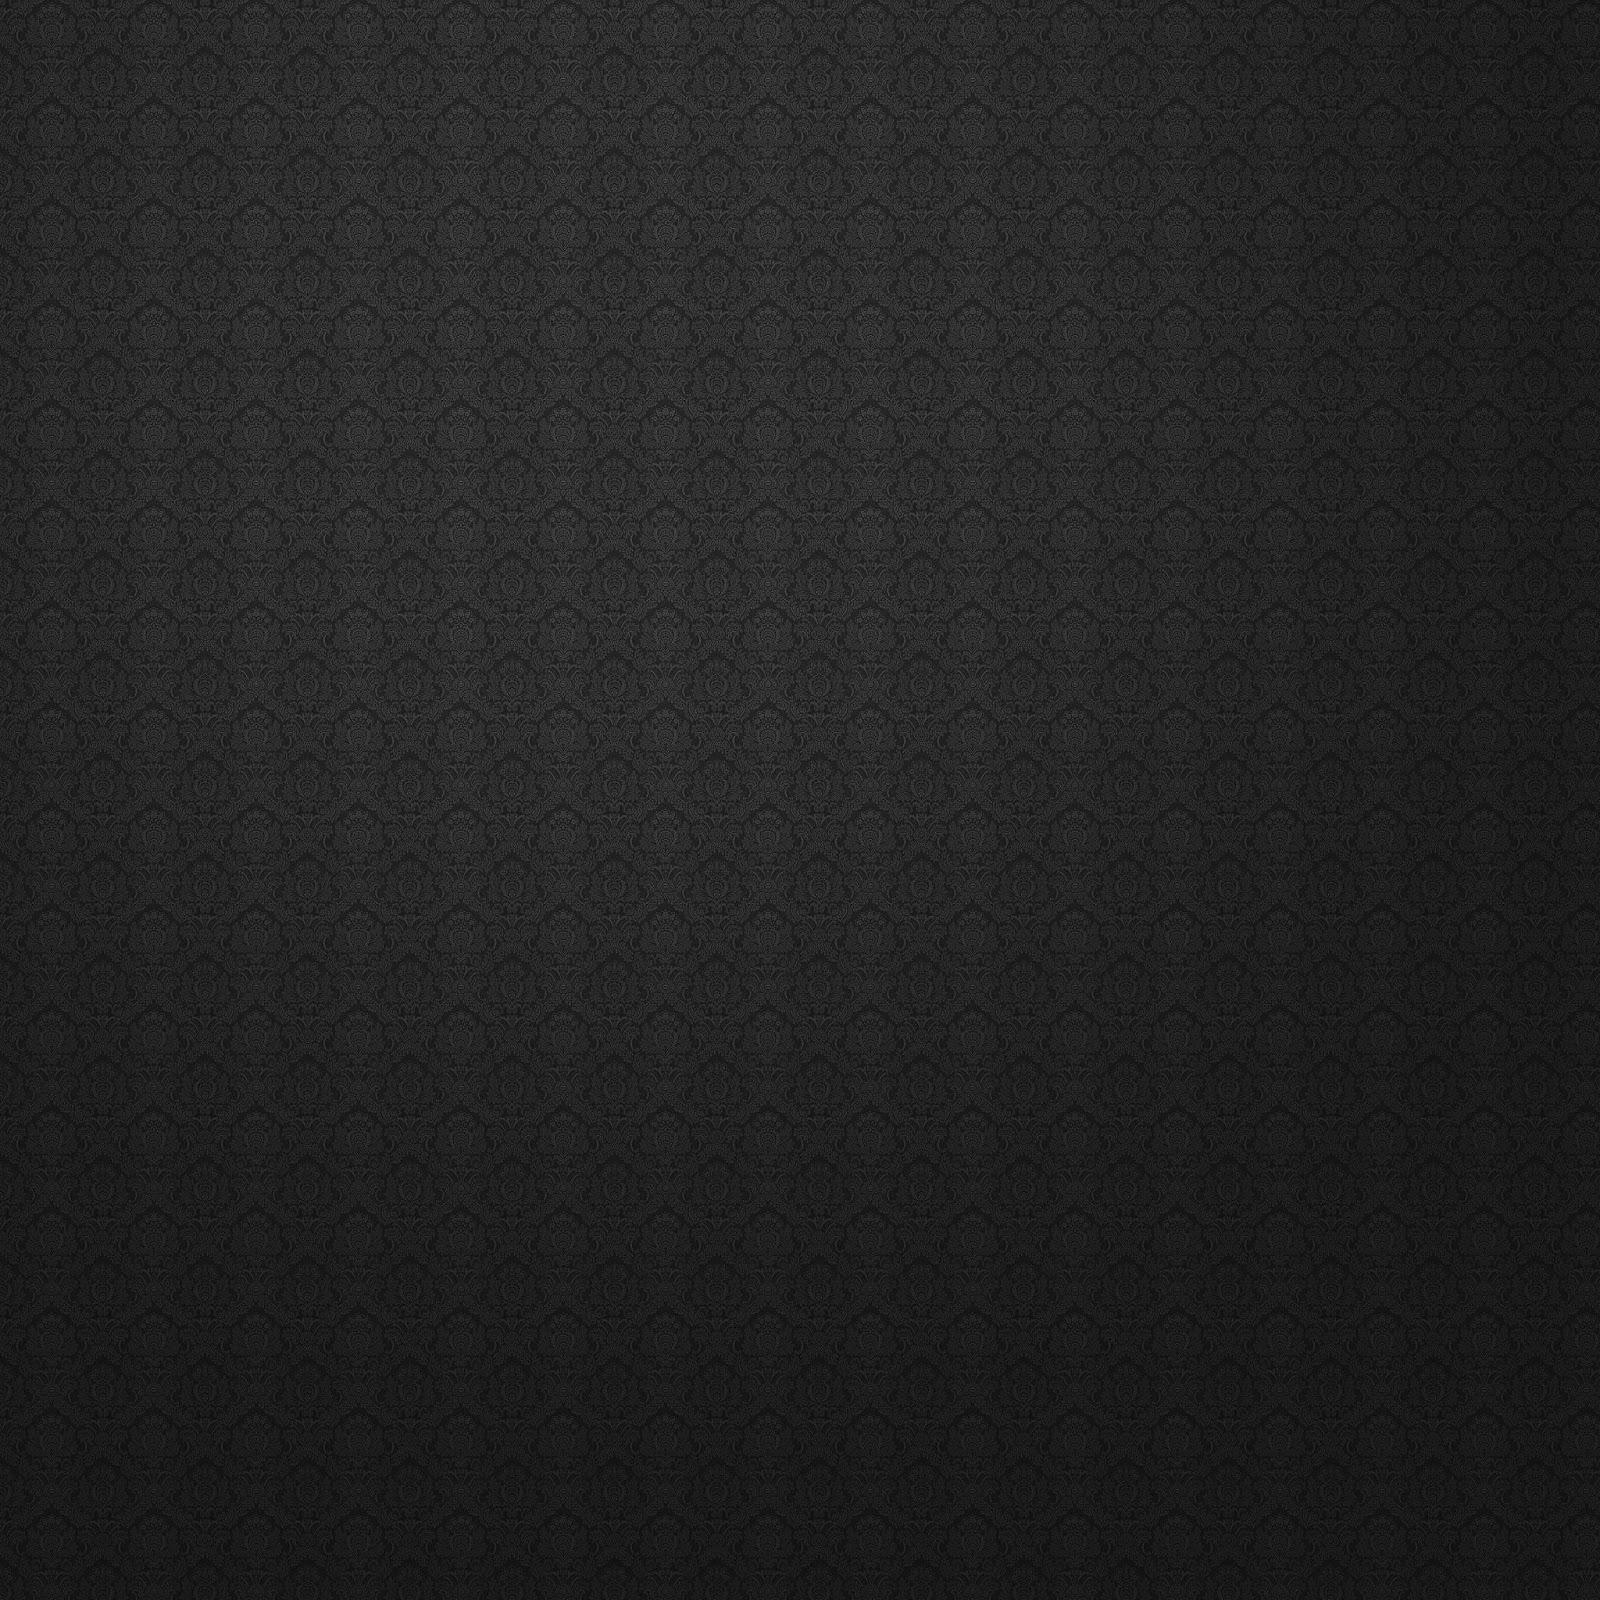 [50+] New IPad HD Christmas Wallpaper On WallpaperSafari